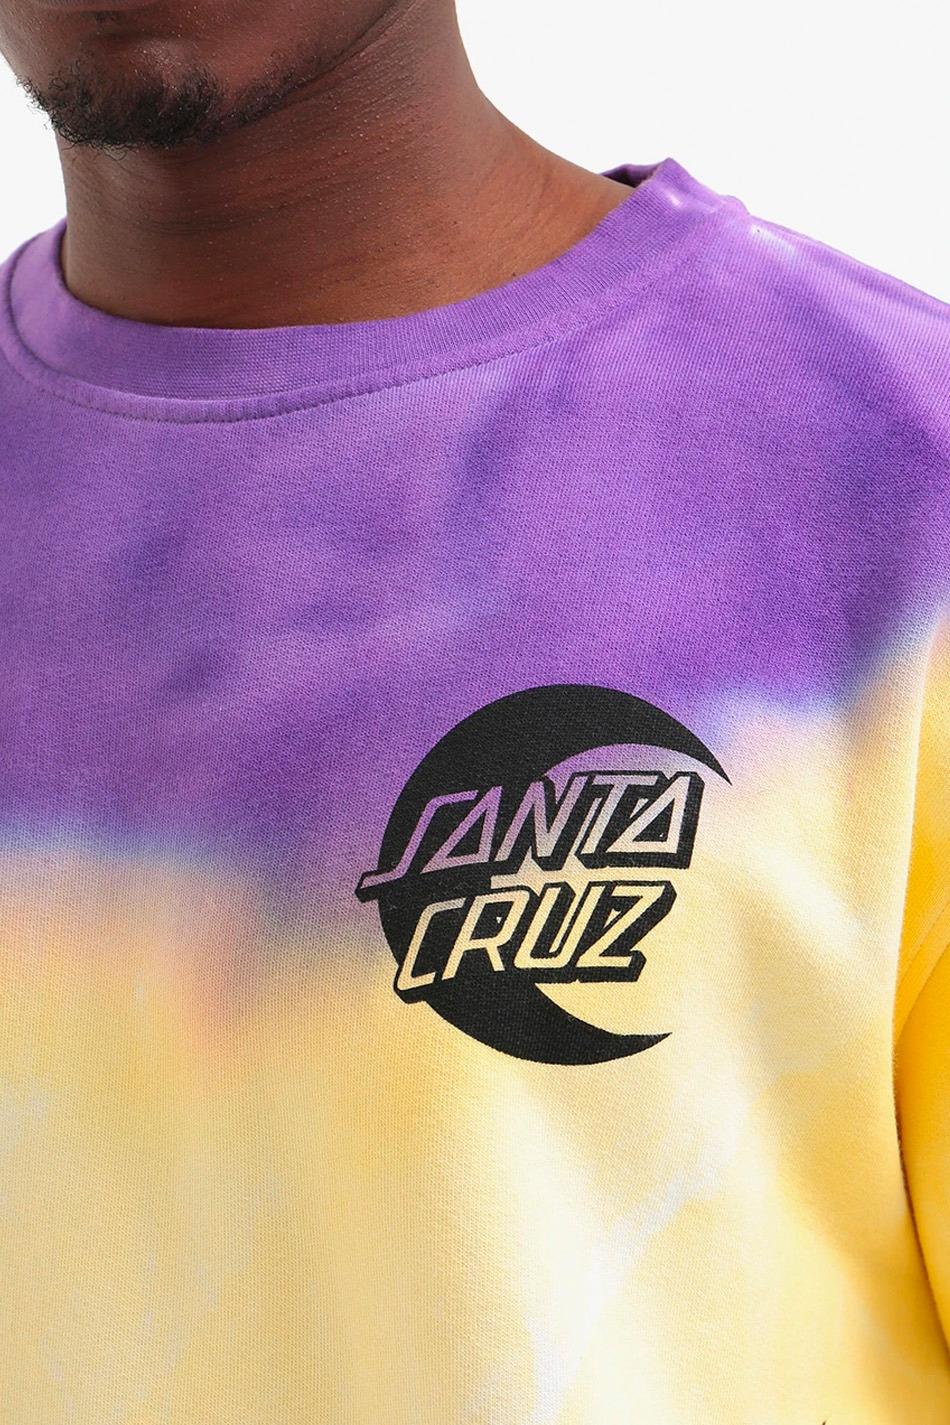 Santa Cruz Crew Moon Dot Yellow/Purple